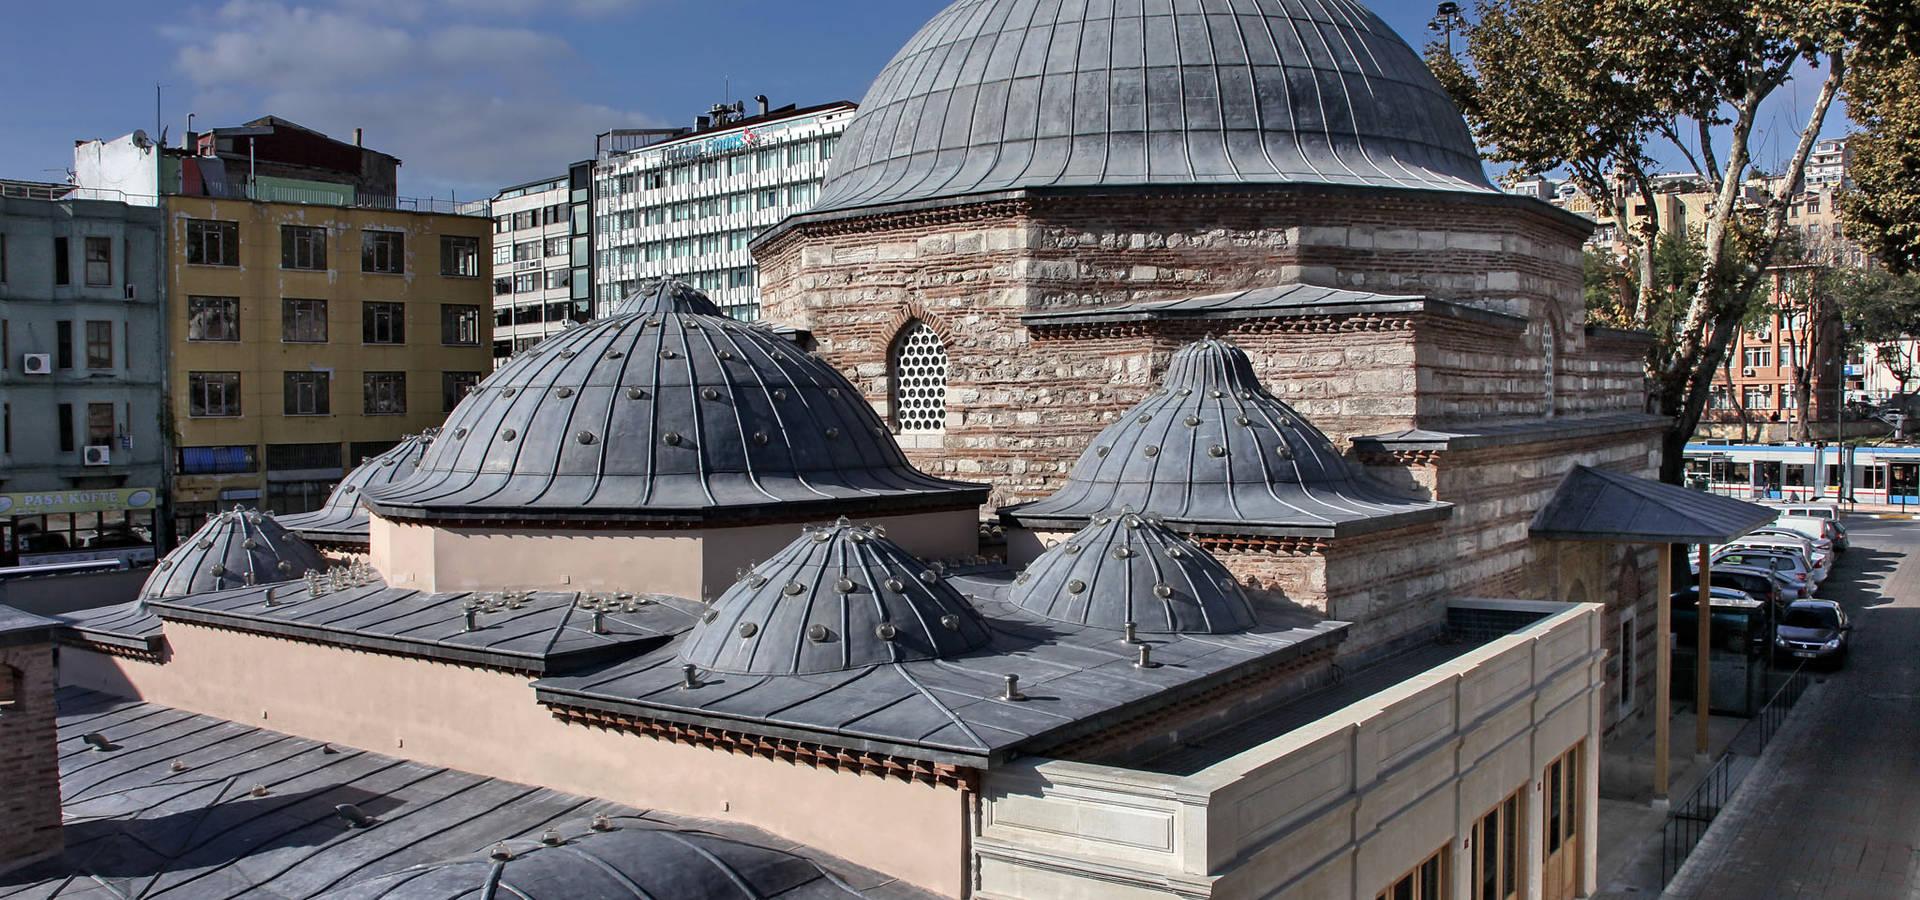 Cafer Bozkurt Architecture